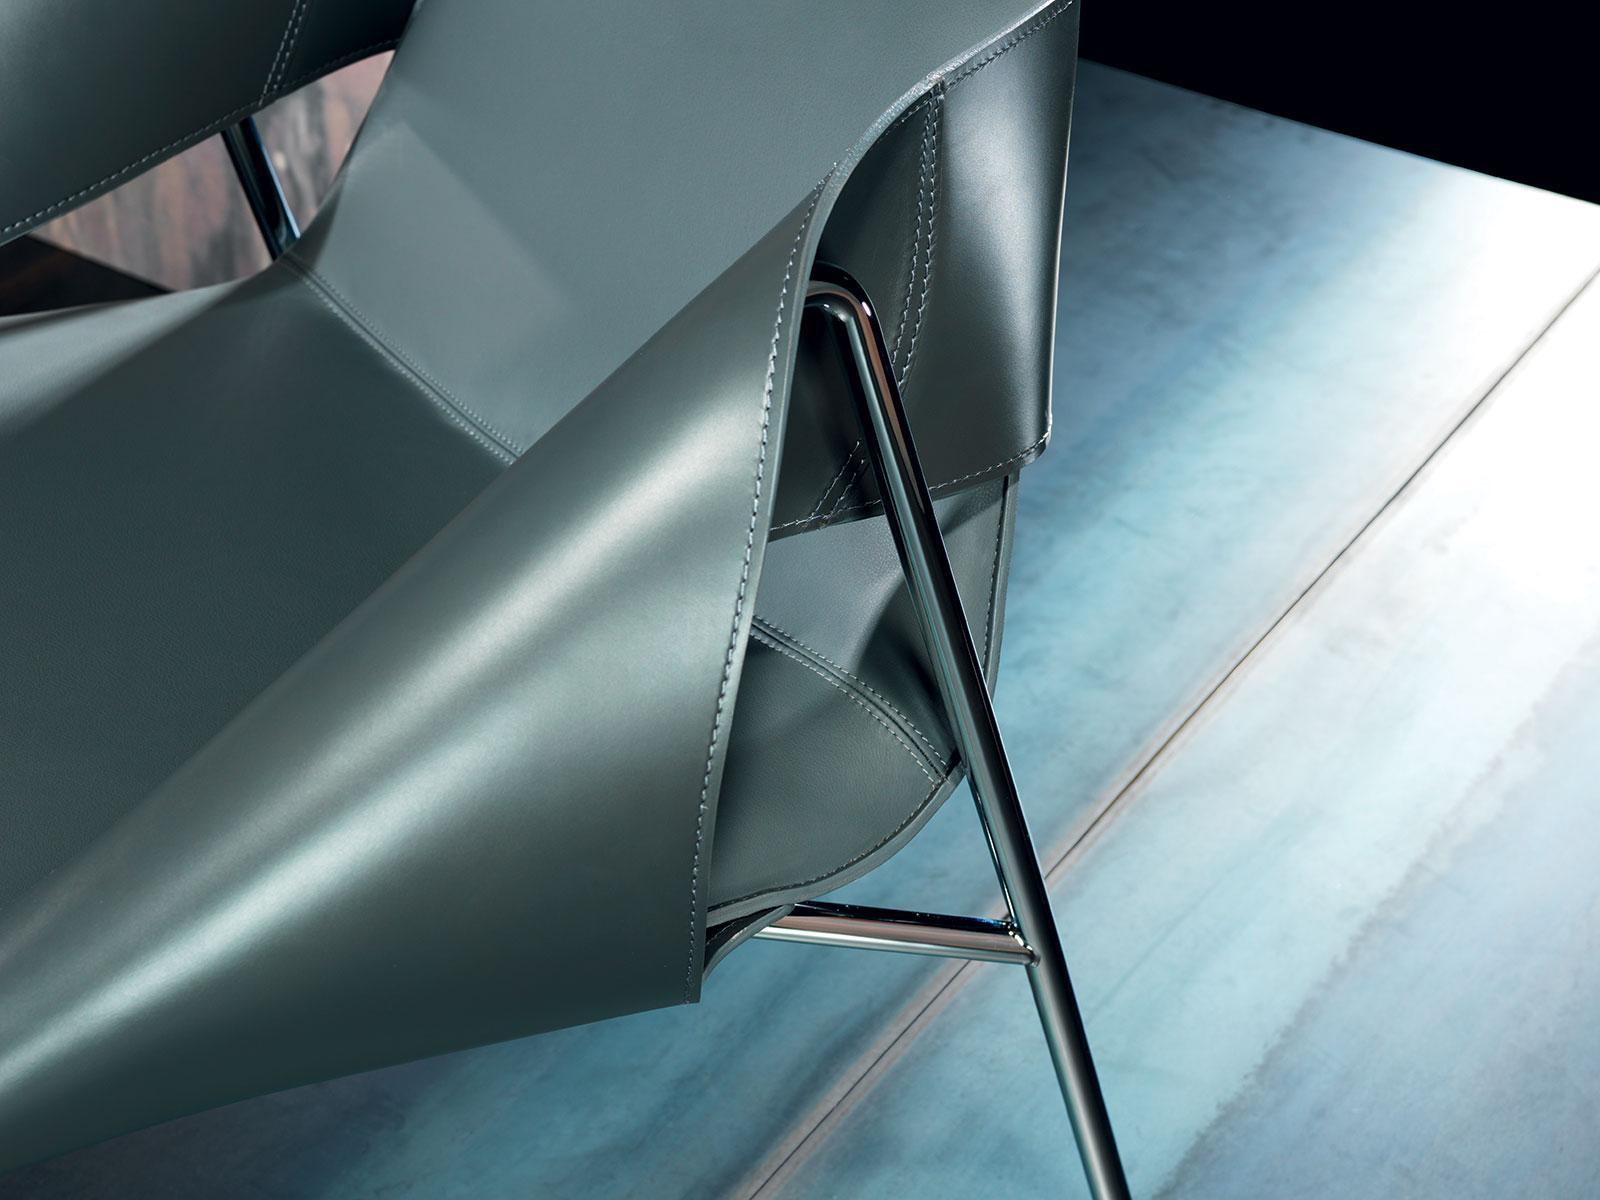 armchair back support ergonomics headrest leather modern online footrest xl yellow stores shops design sale italia manufacturers quality websites